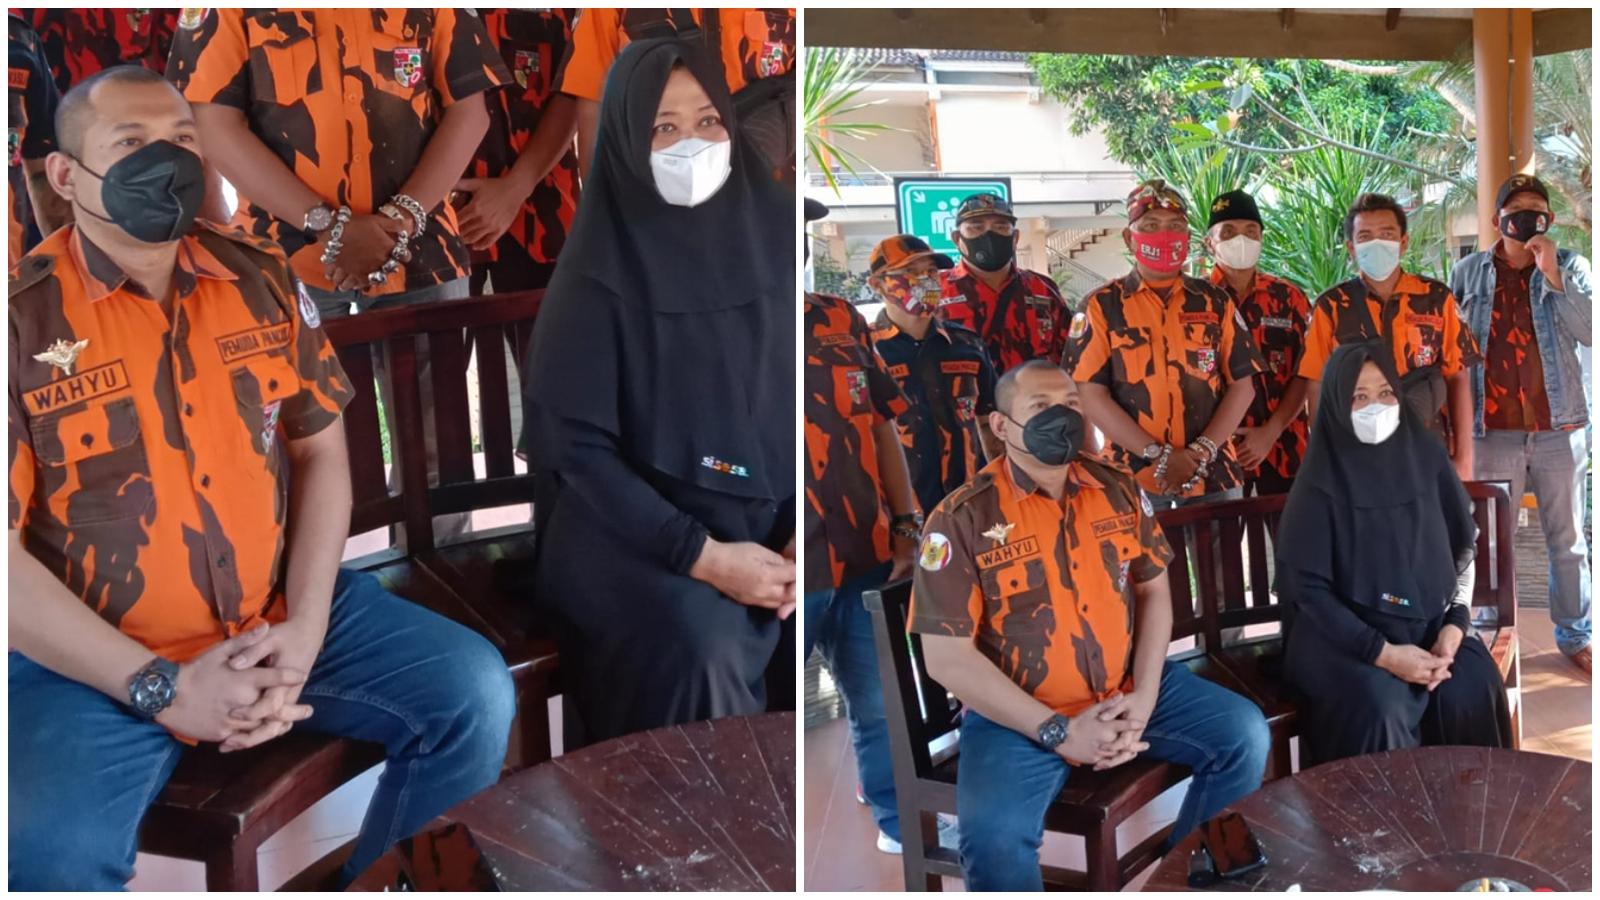 Ketua MPC Pemuda Pancasila Kabupaten Blitar, Henrin Mulat Wiyati Didampingi Wahyu Selaku Ketua Komando Inti Surabaya dan Kader Pemuda Pancasila saat Jumpa Pers